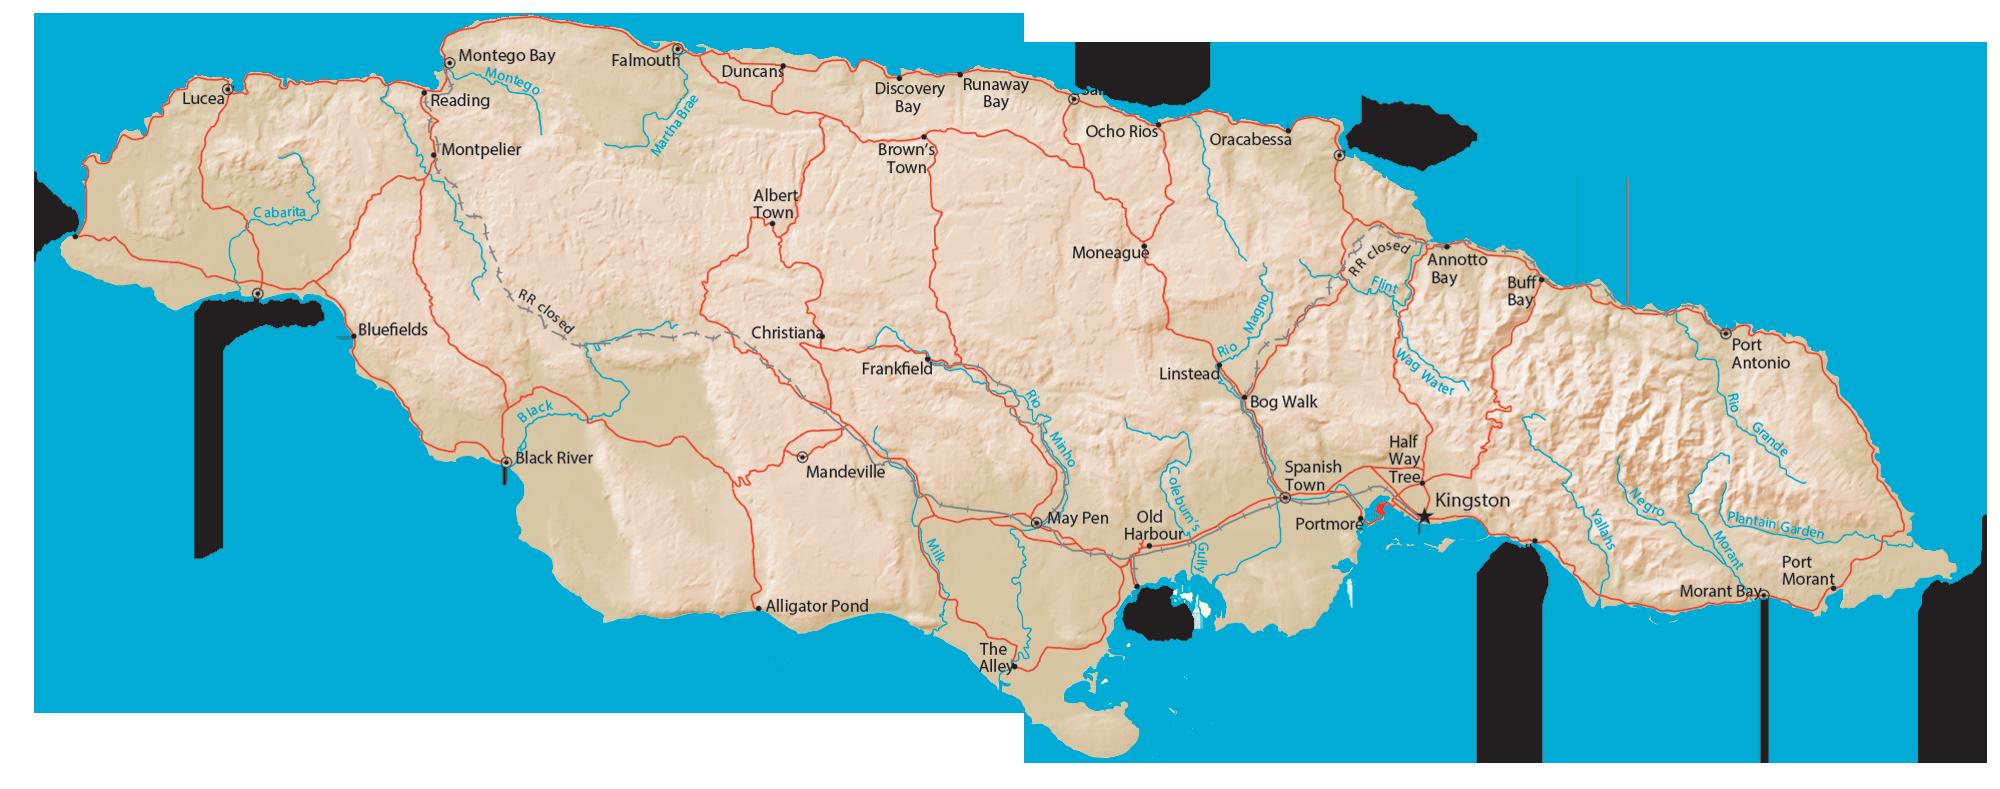 Jamaica Physical Map